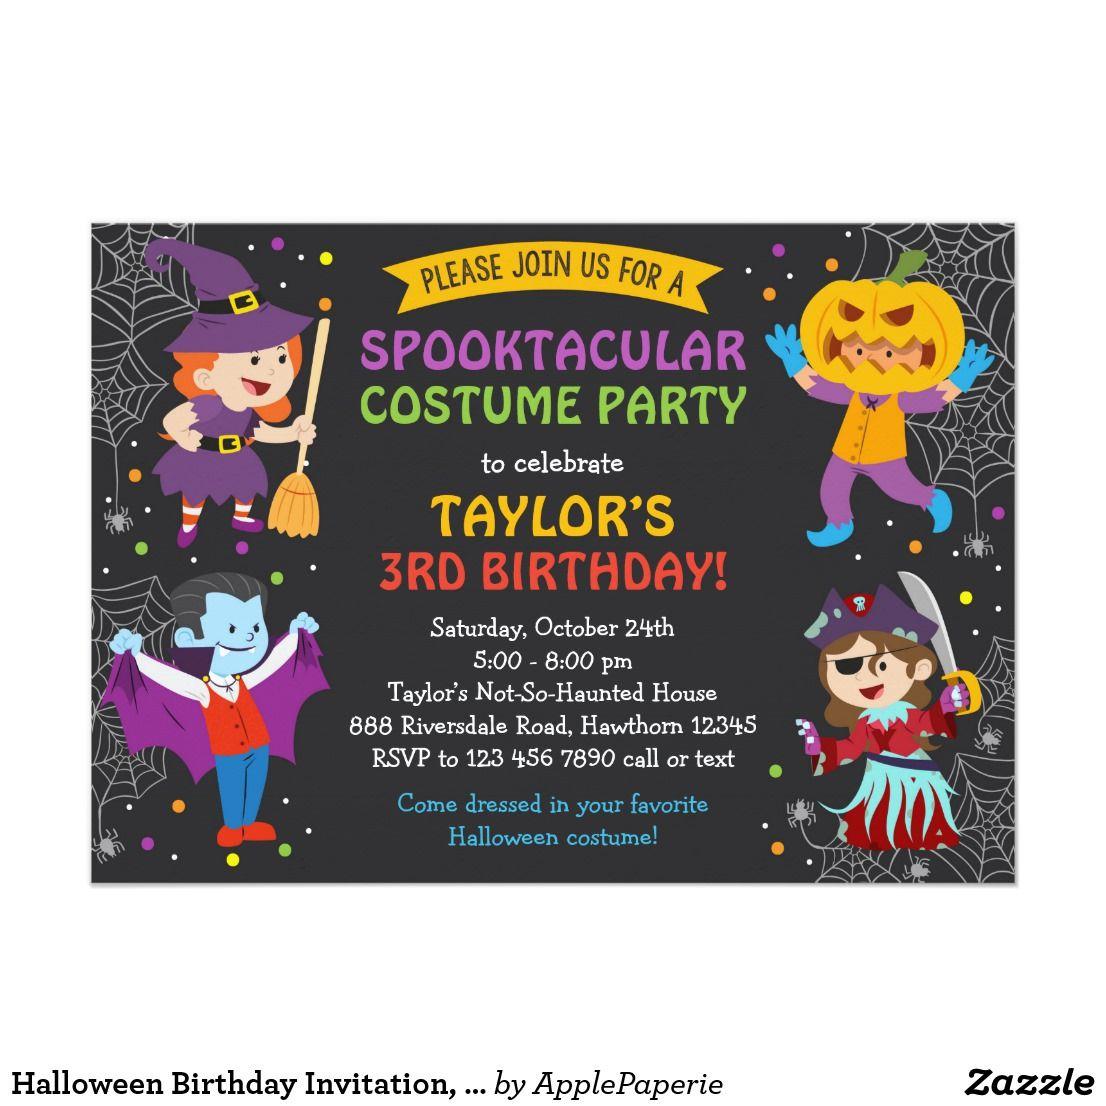 Halloween Birthday Invitation, costume party, kids Card | Halloween ...